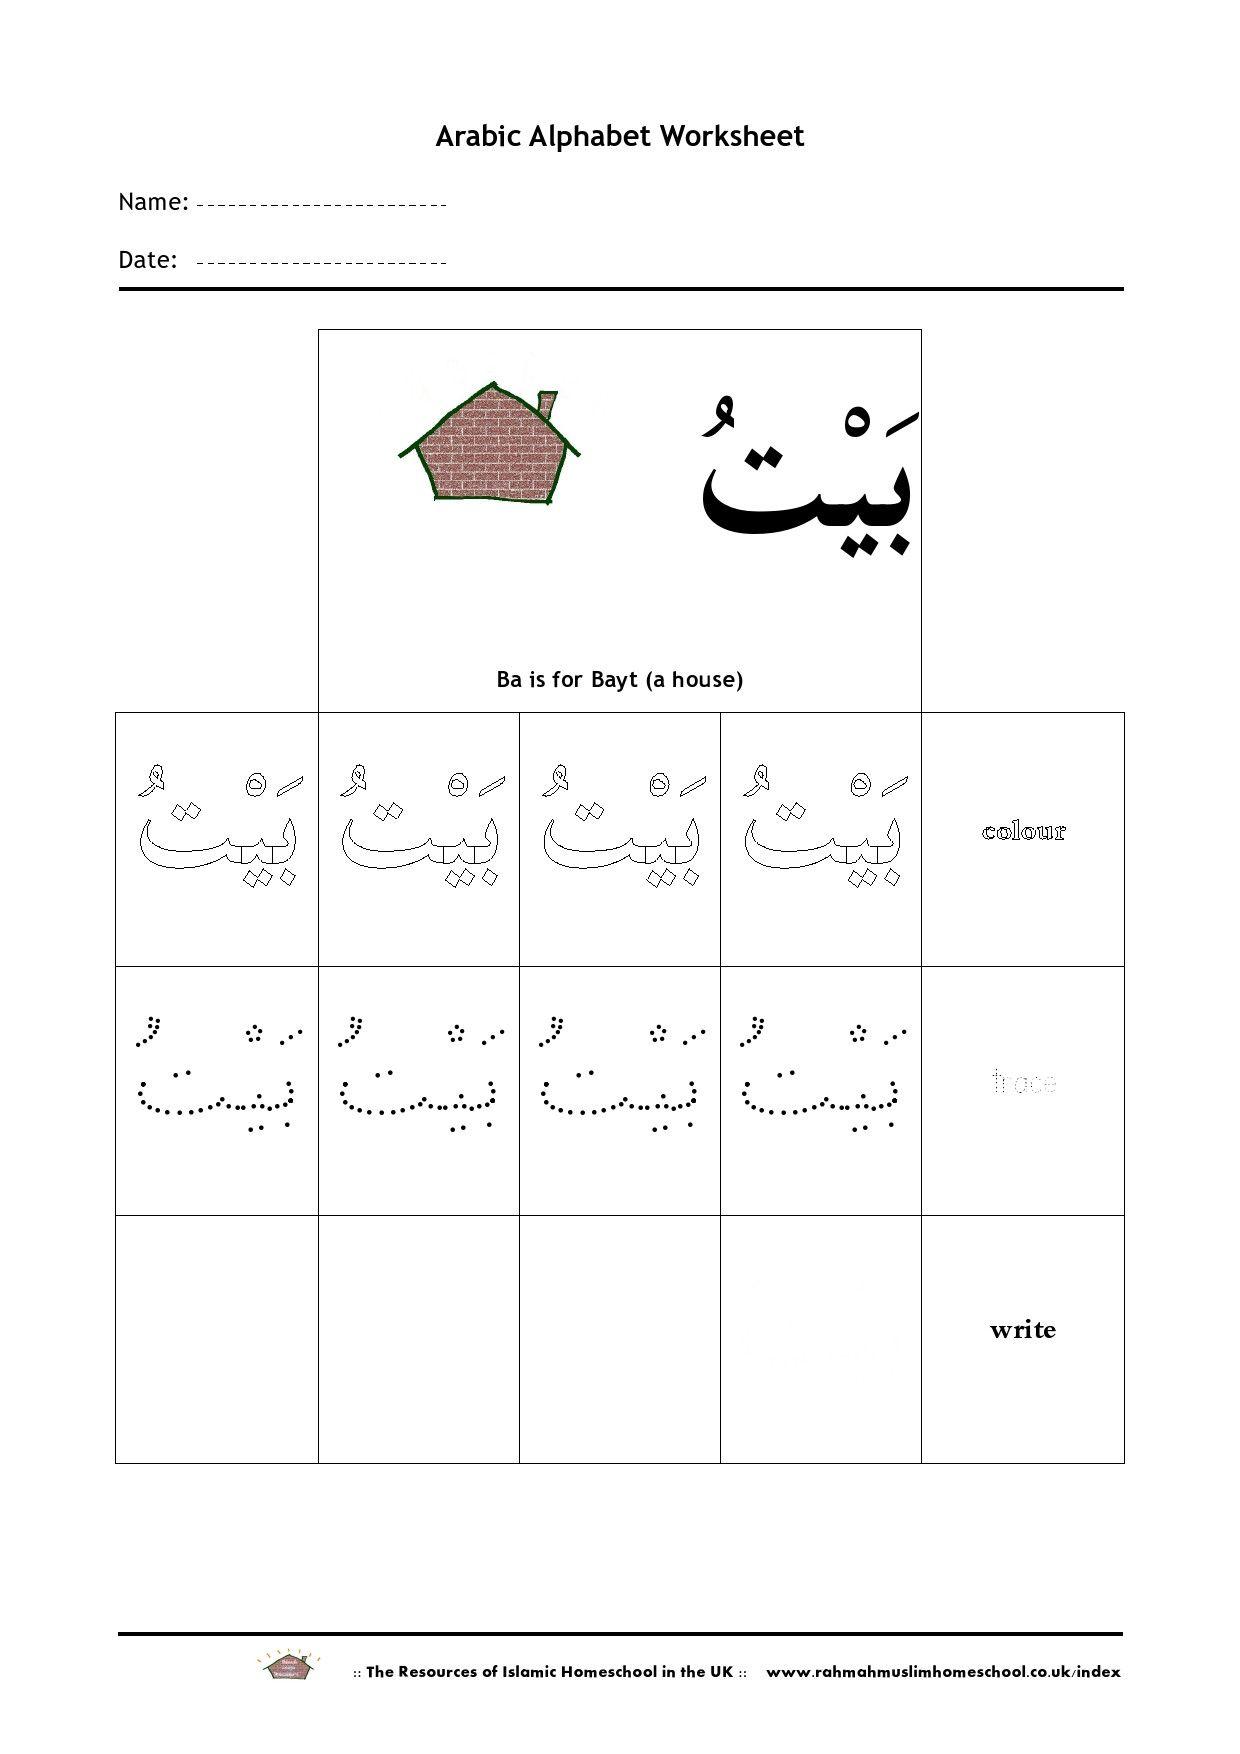 Arabic Alphabet Worksheets Printable In